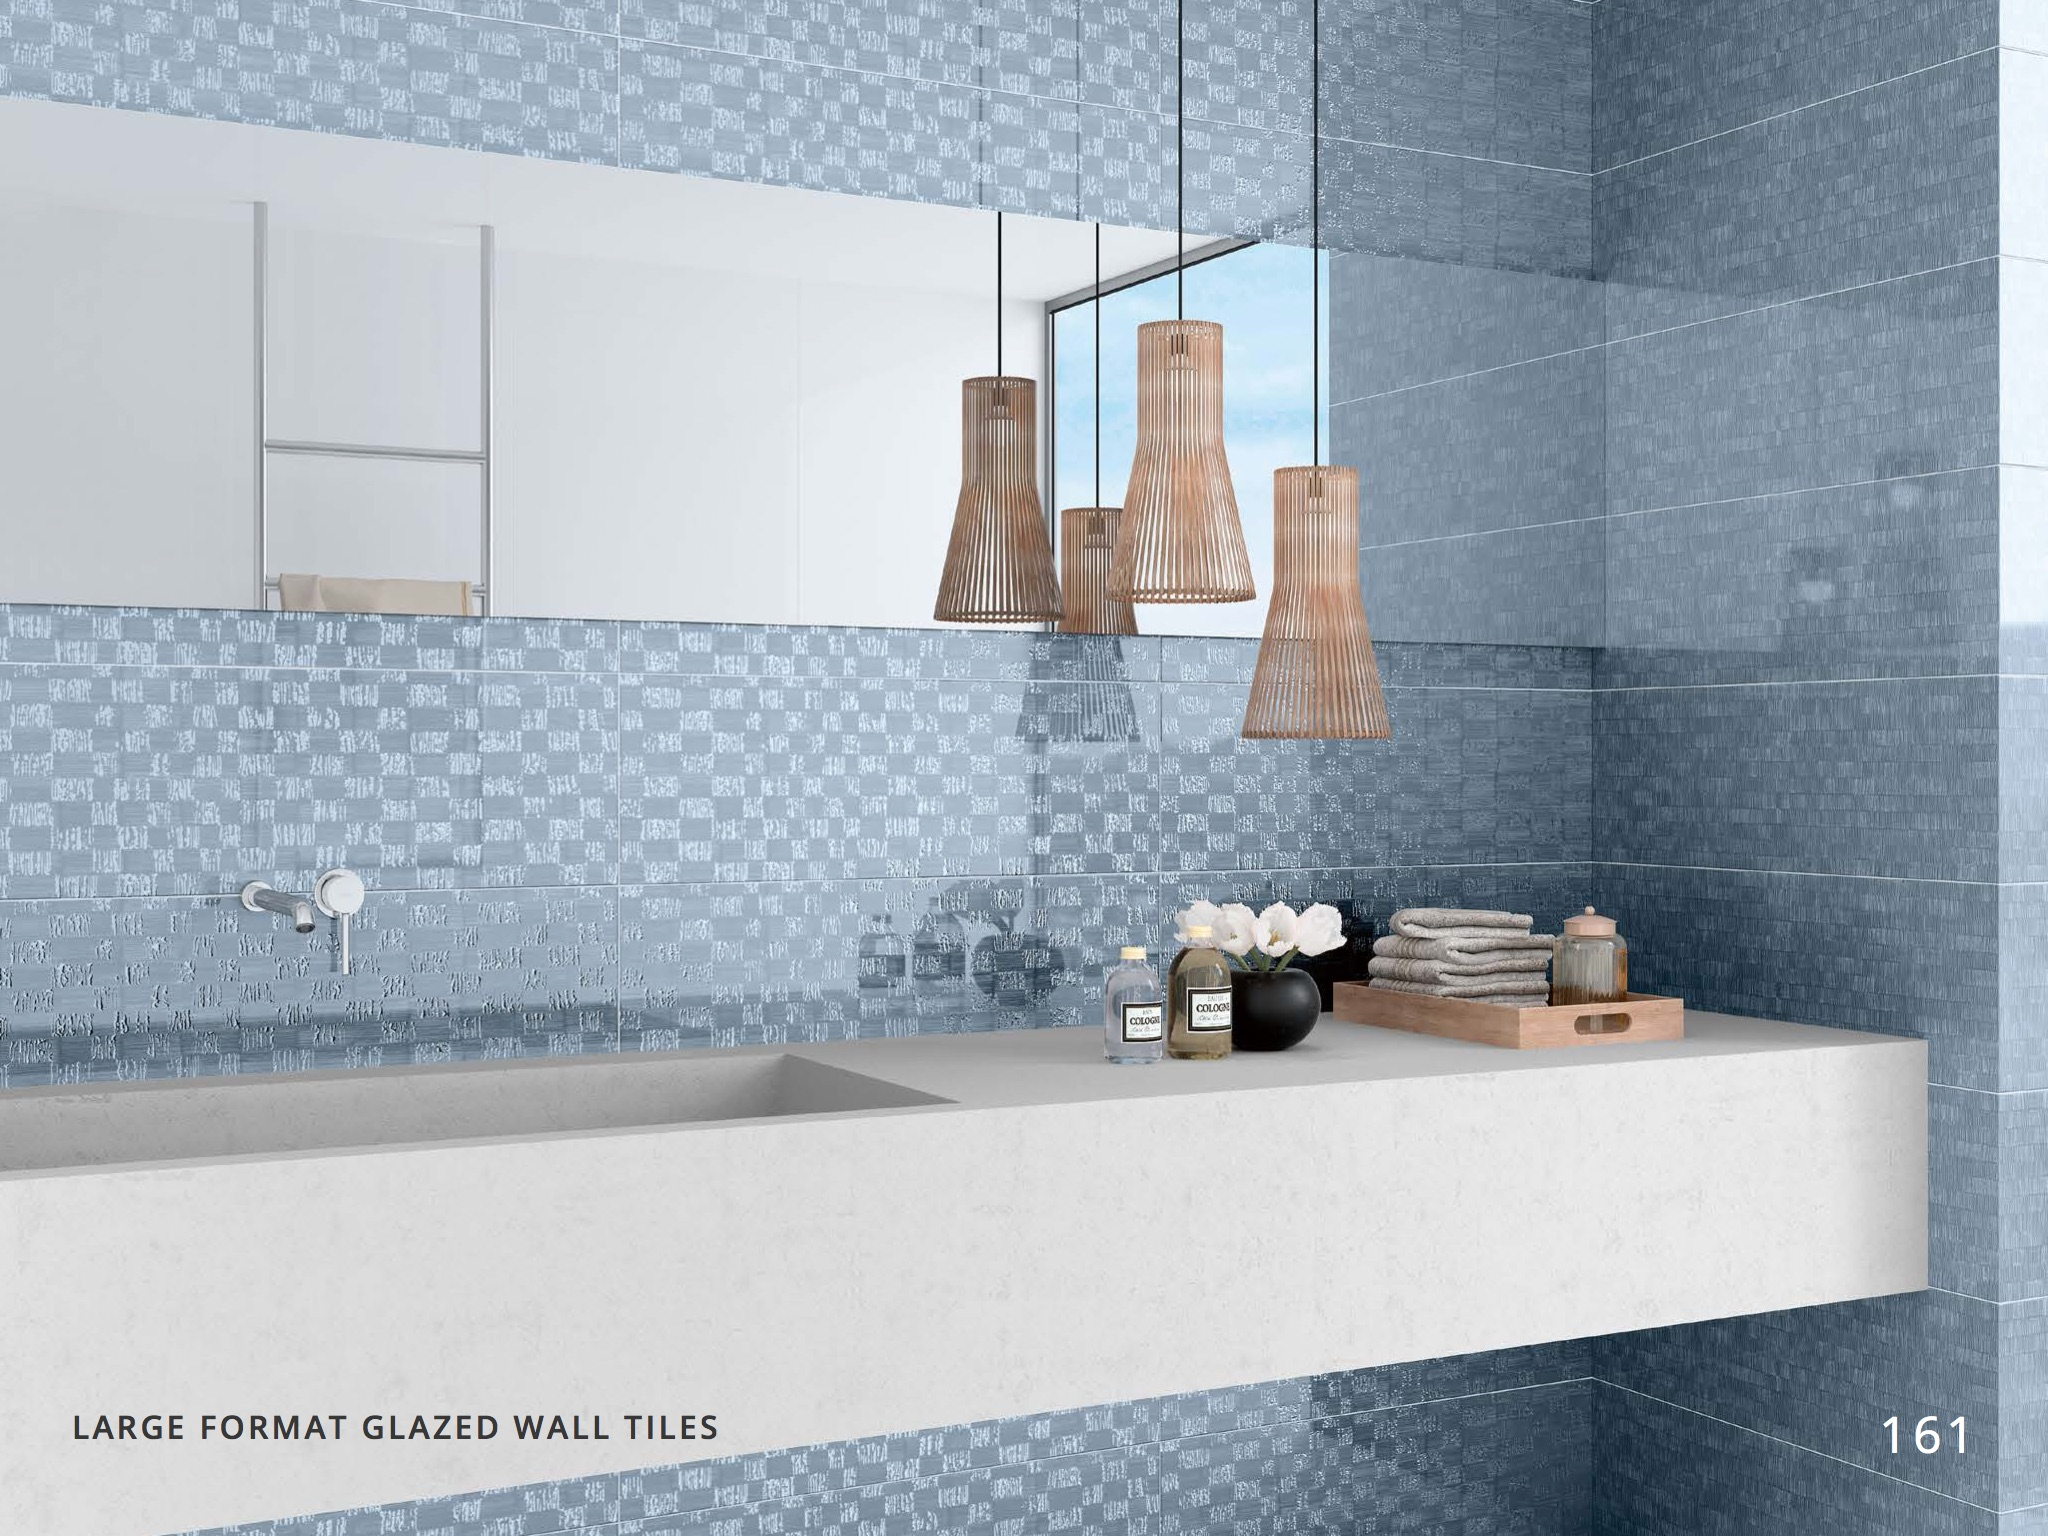 Large Format Glazed Wall Tiles H E Smith Ltd Hanley